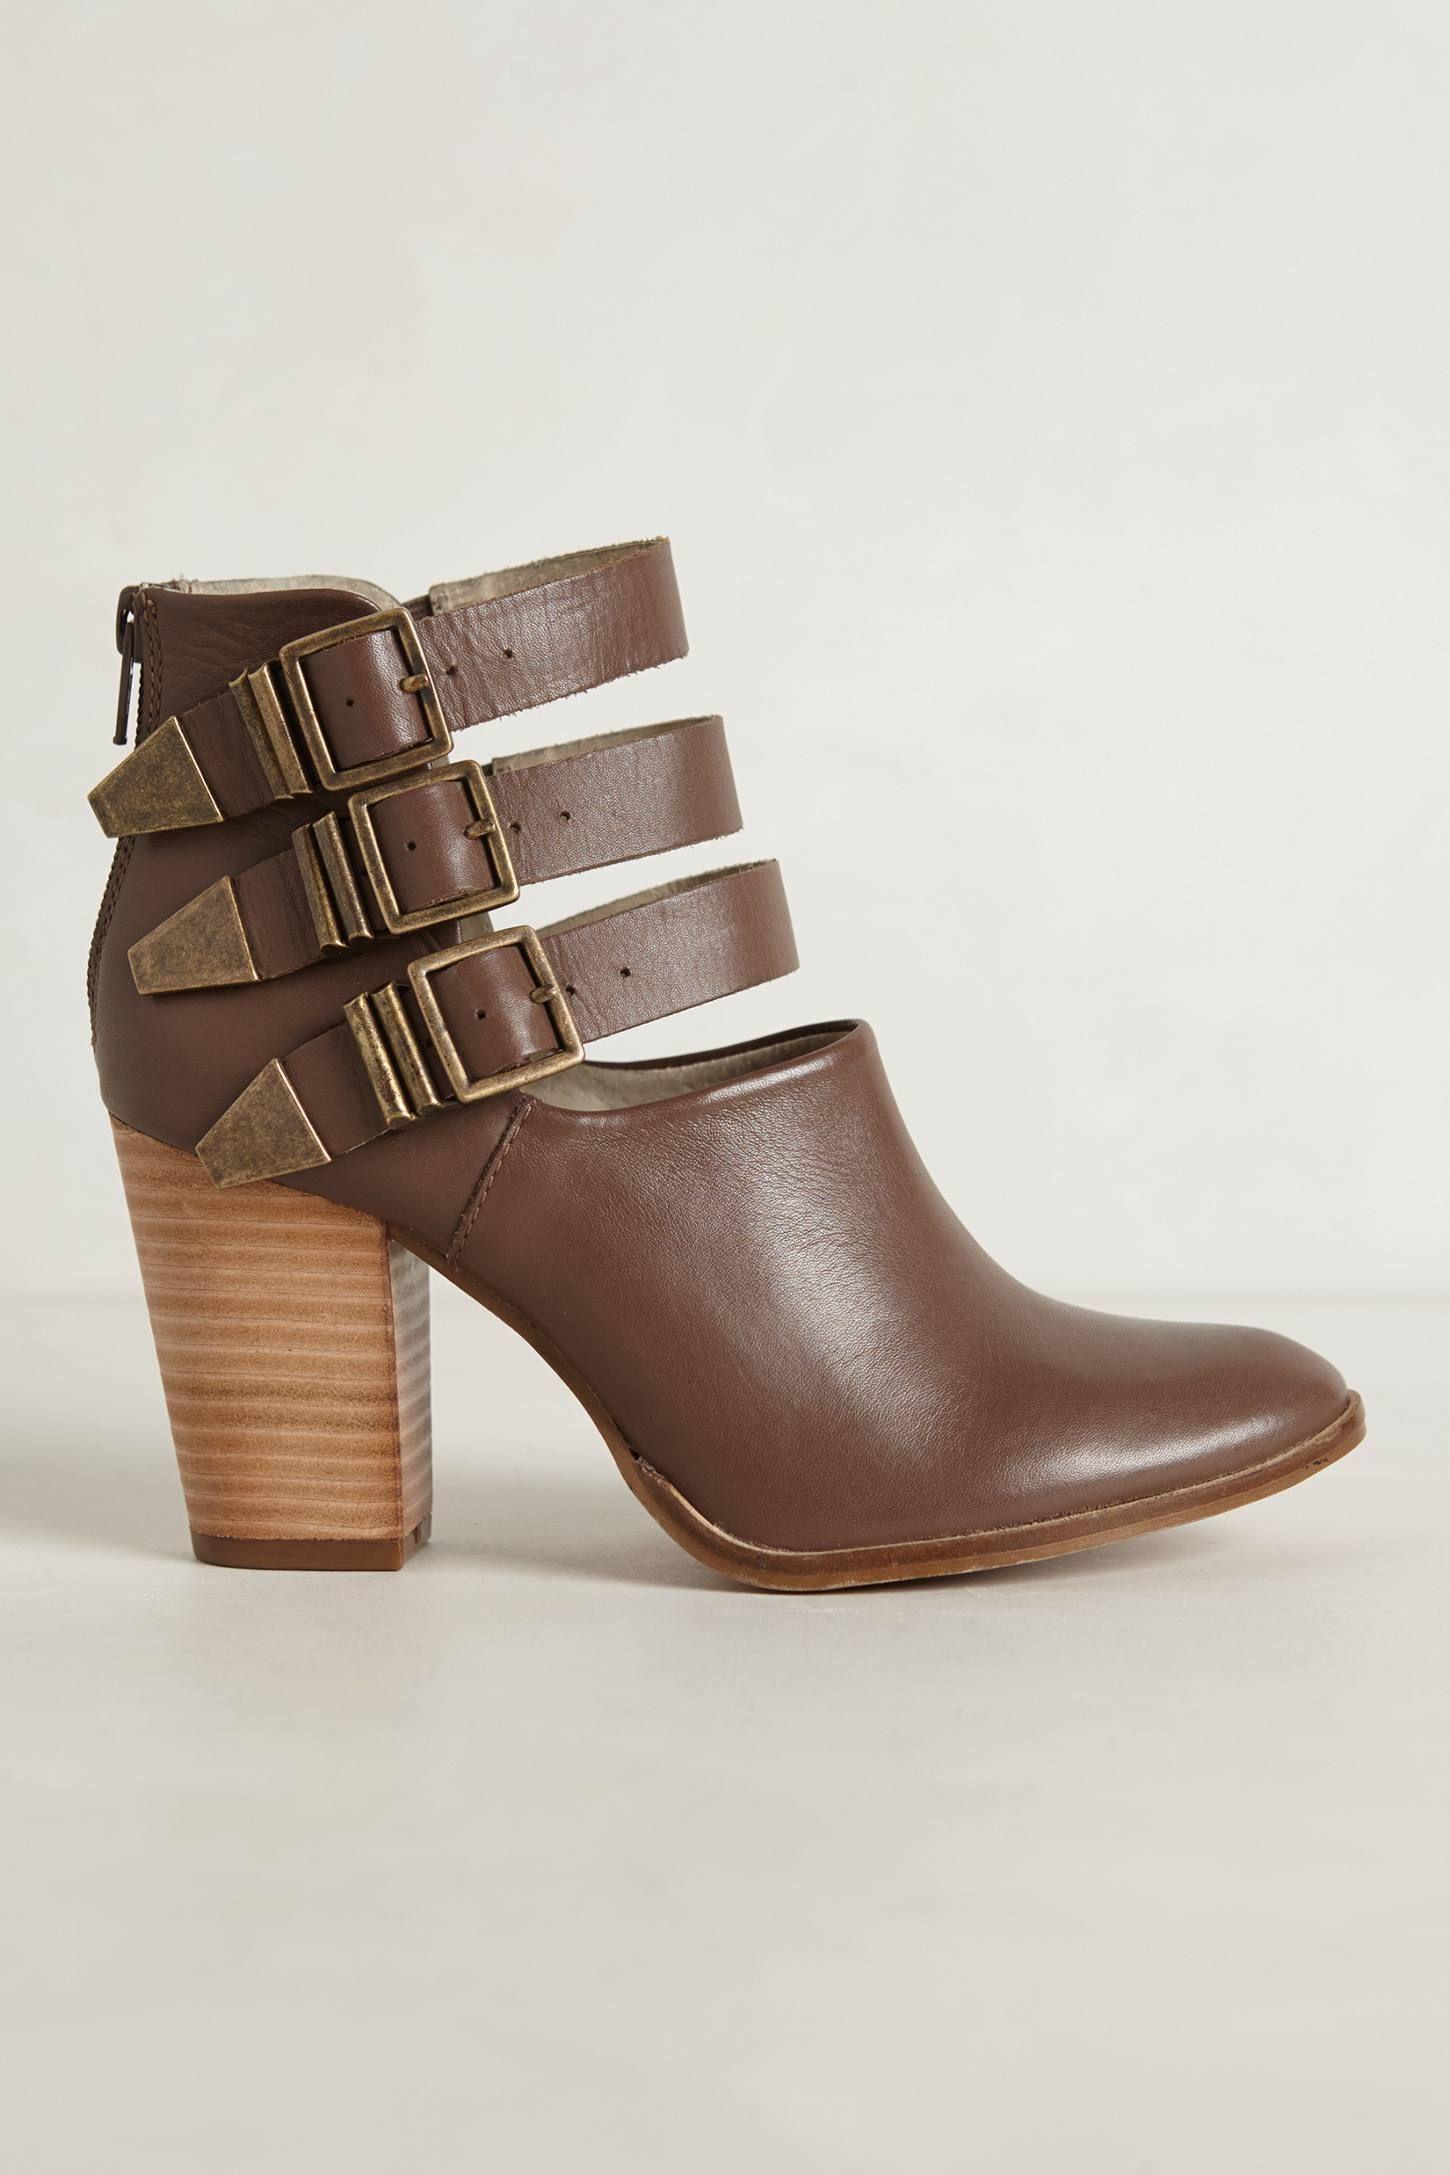 Seychelles Haywire Boots, Seychelles heels, Heeled boots